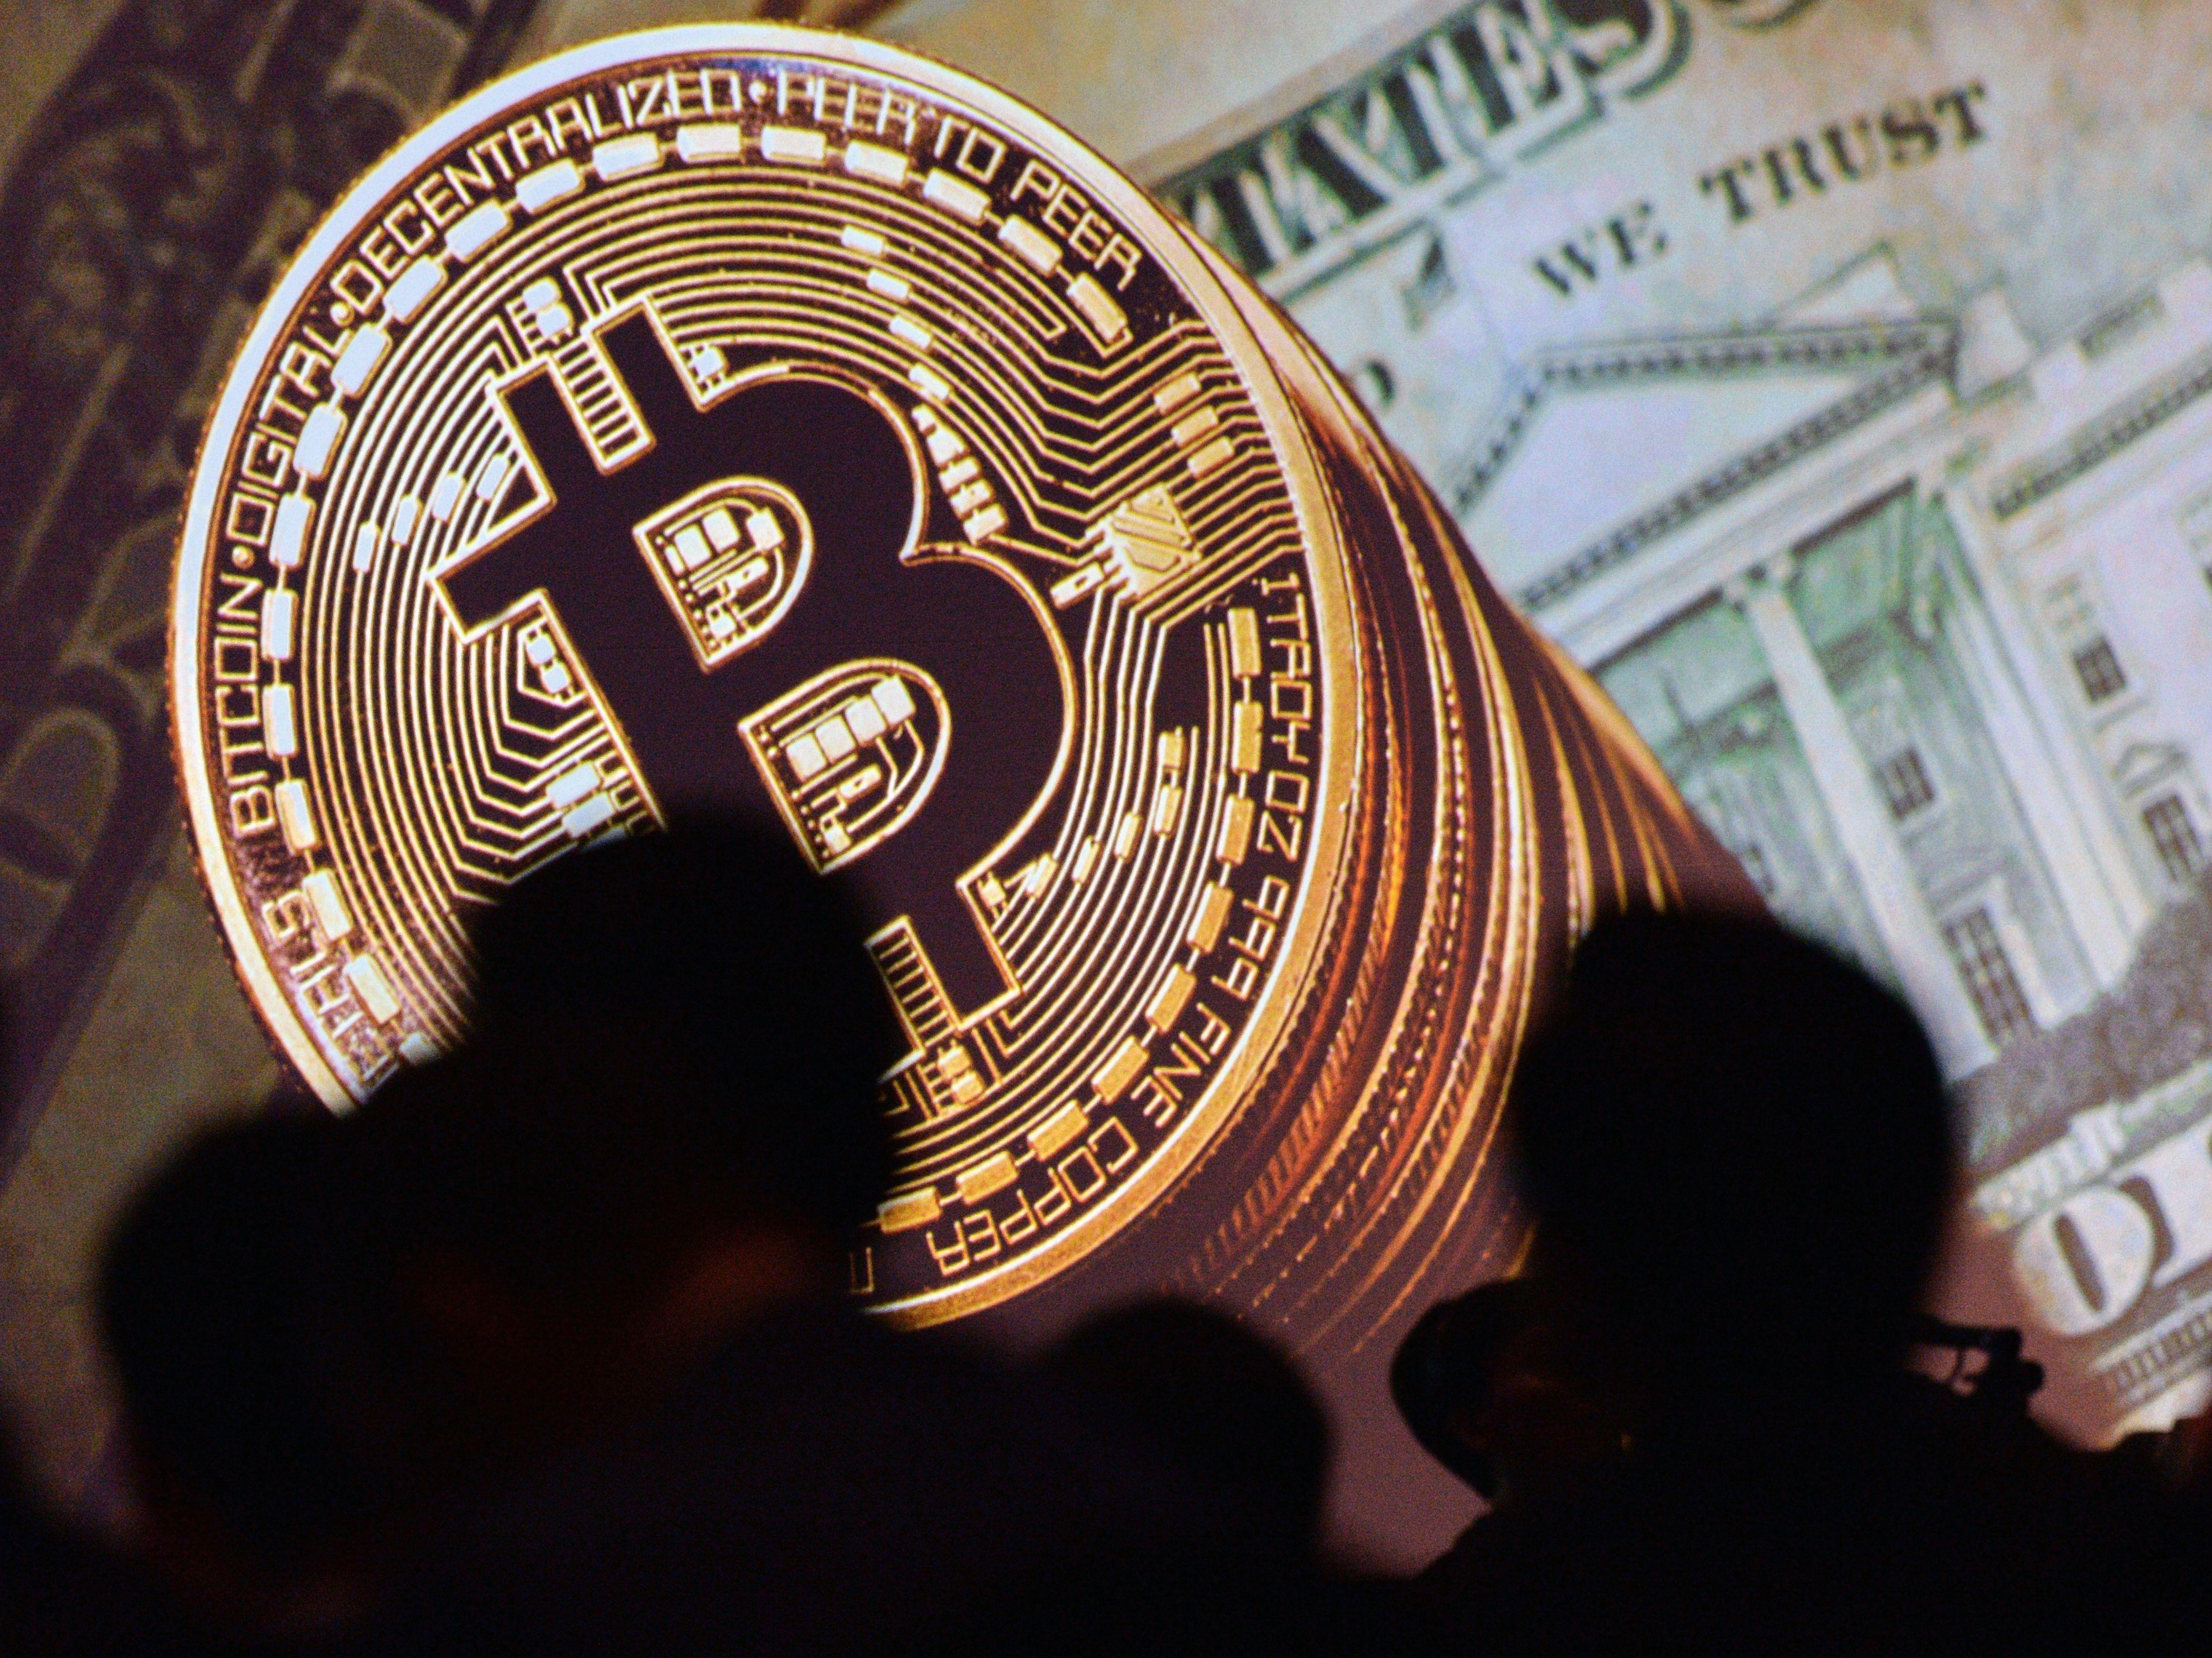 kaip siųsti ką nors bitcoin bitcoin exchange san francisco